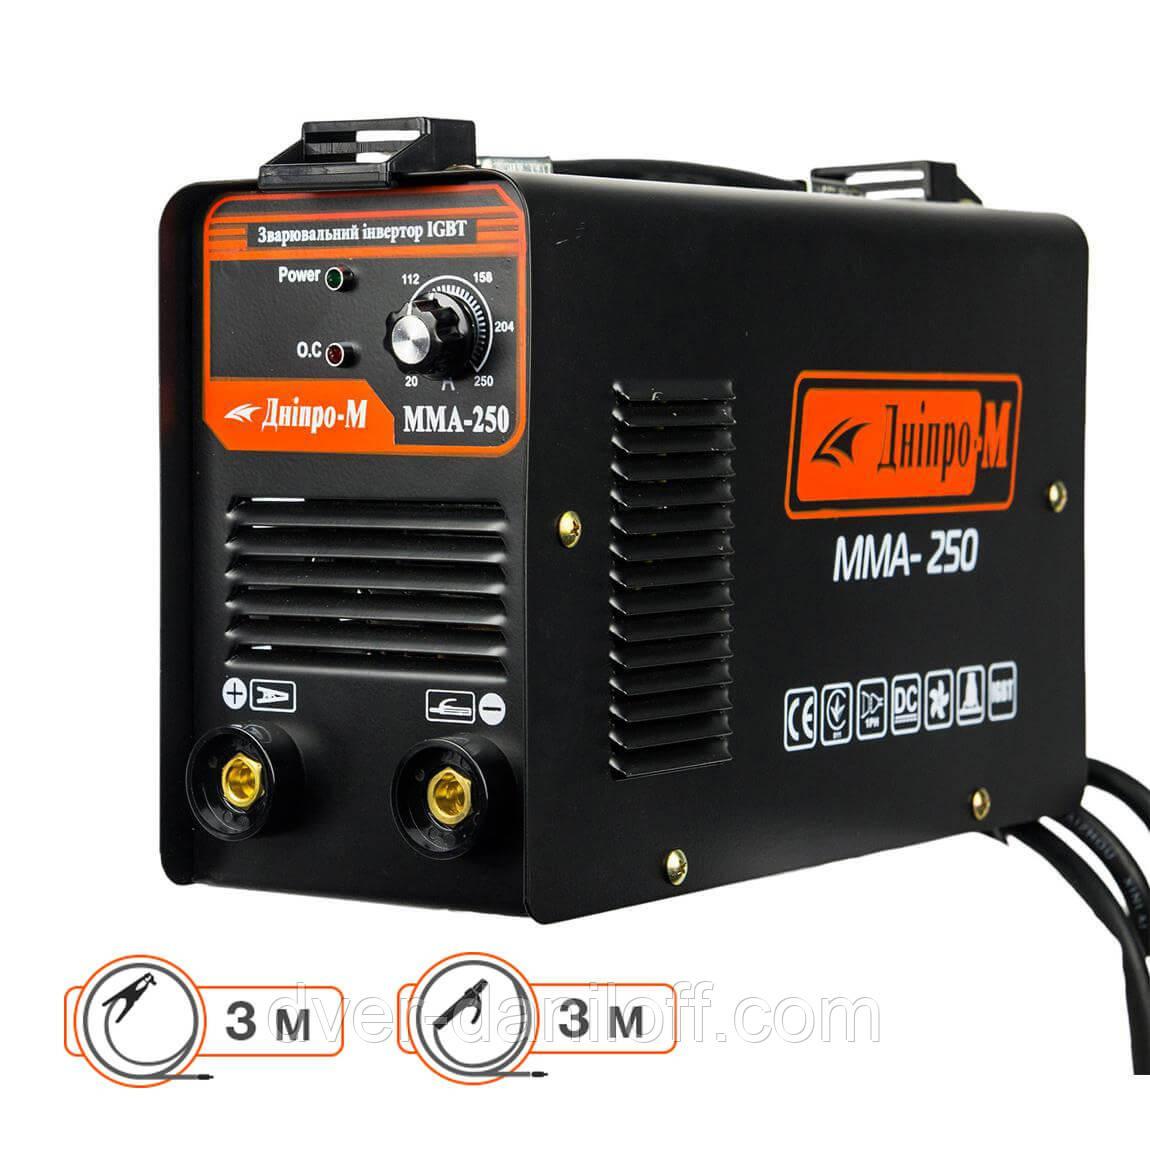 Сварочный инвертор Дніпро-М ММА-250 (3м кабель)